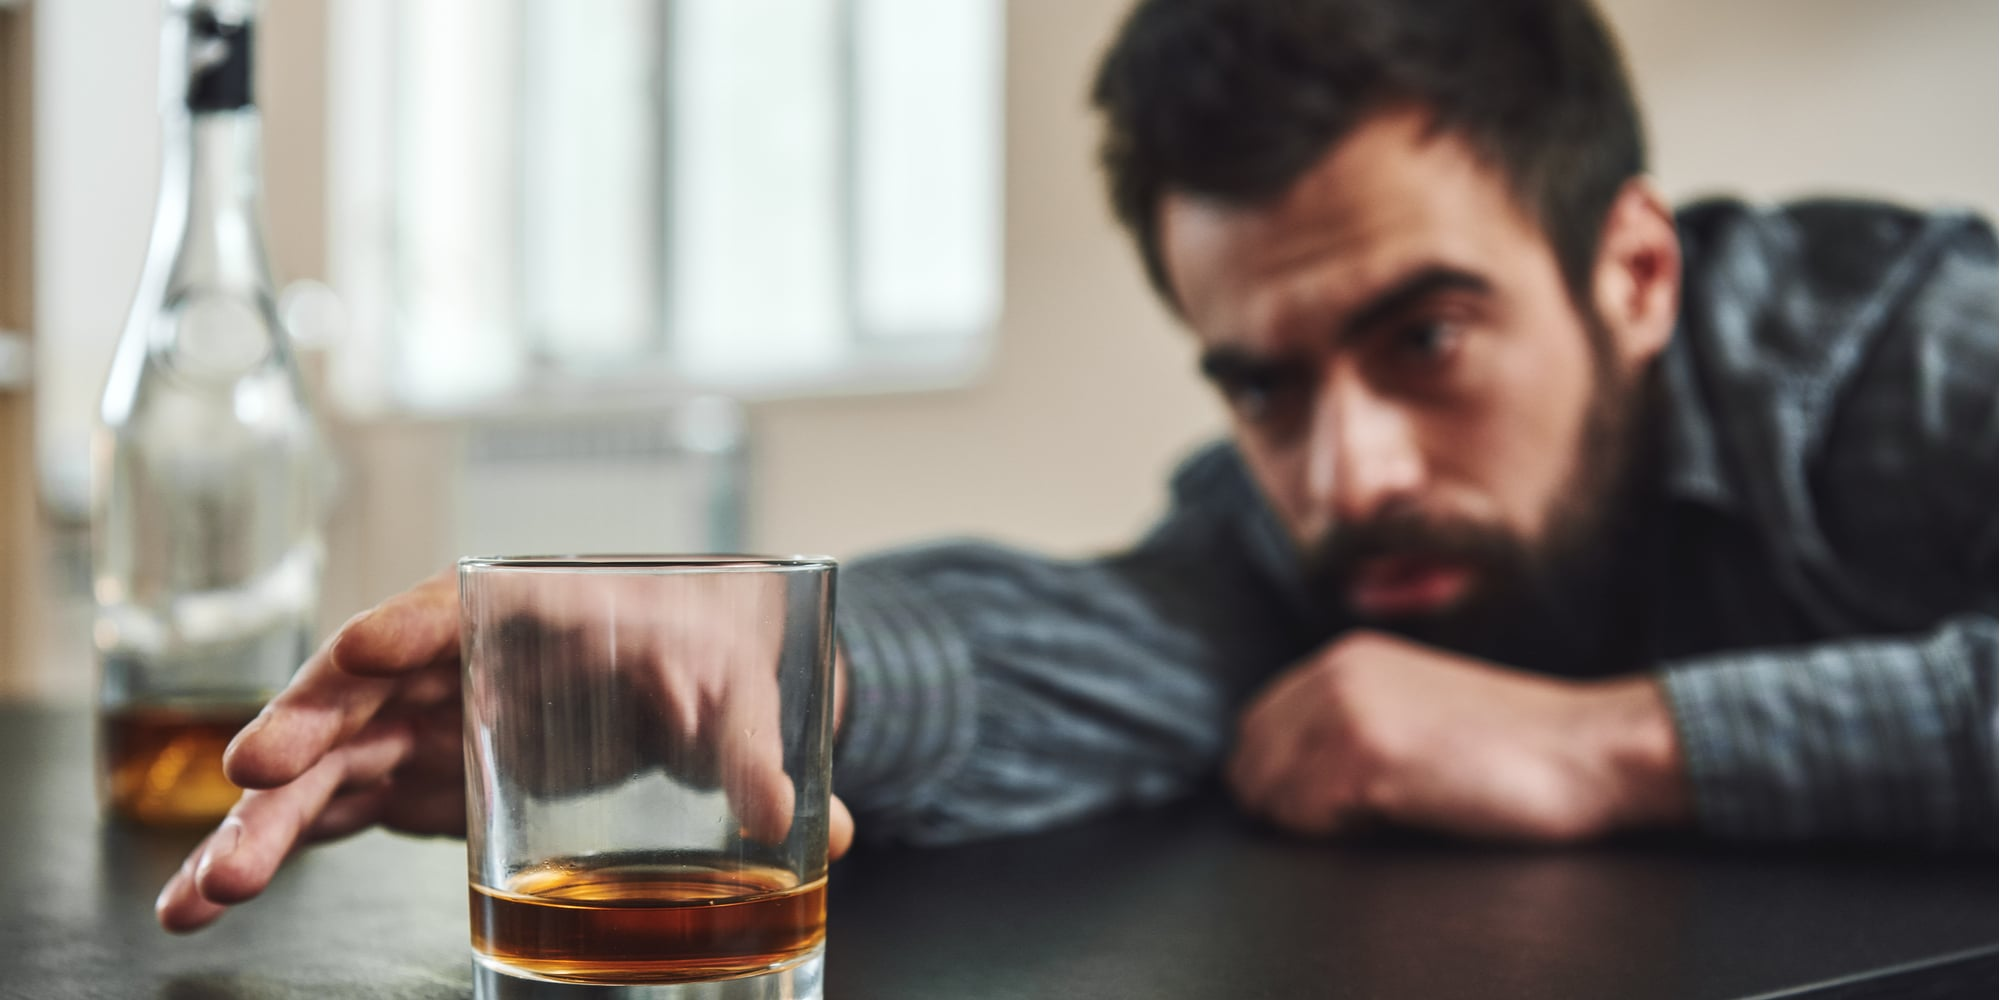 narcissism and alcoholism